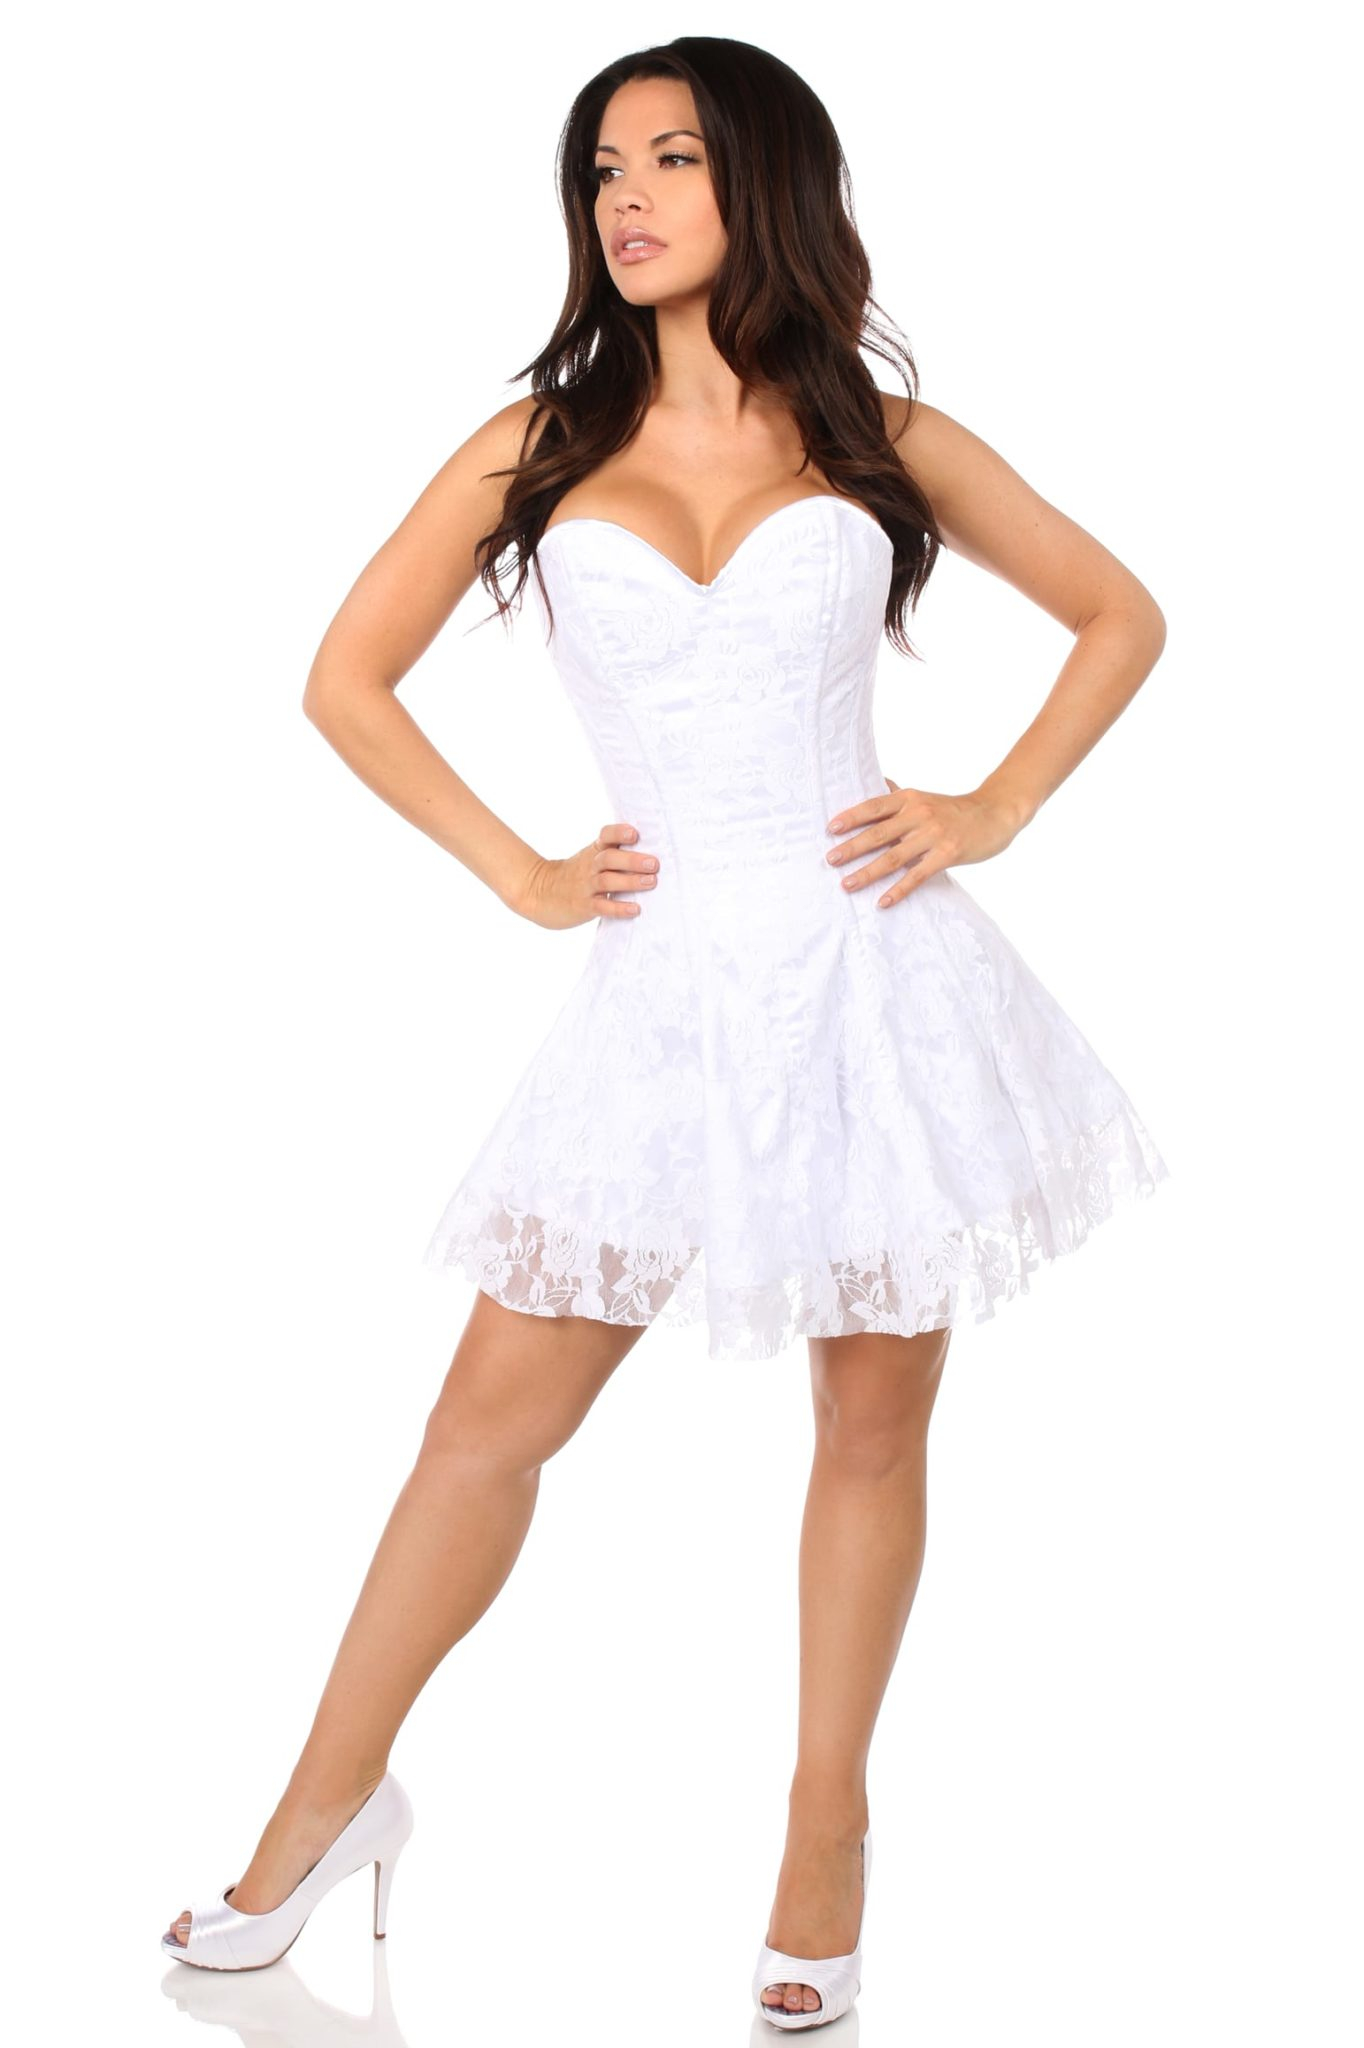 Lavish White Lace Corset Dress 6